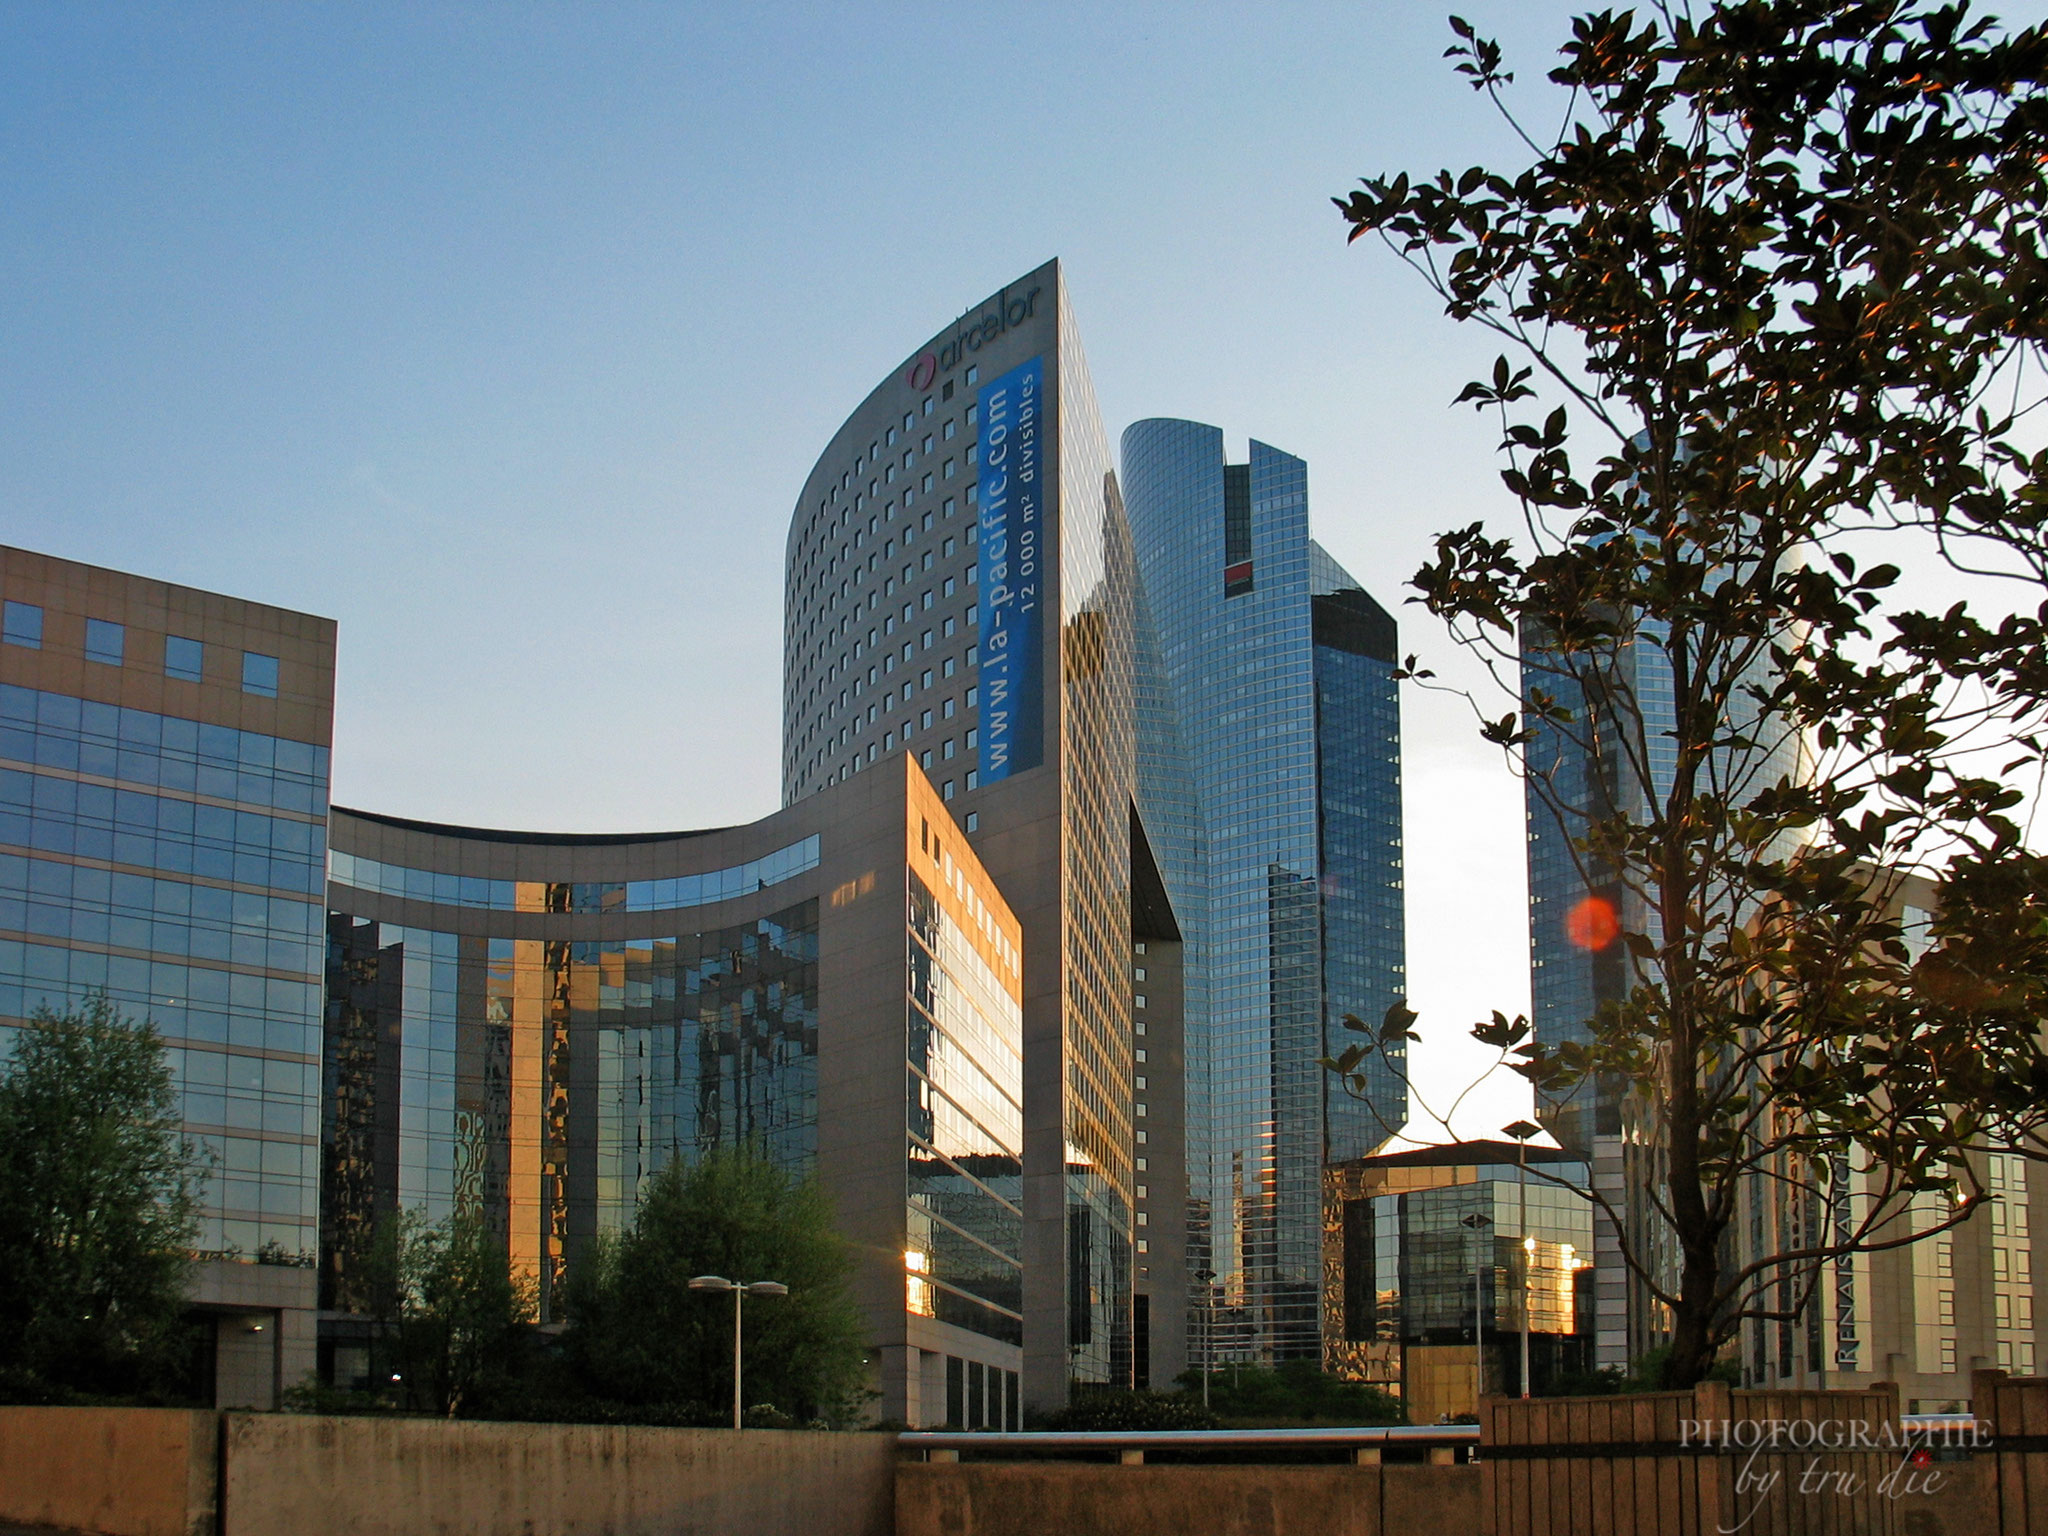 Bild: Büroviertel La Défense